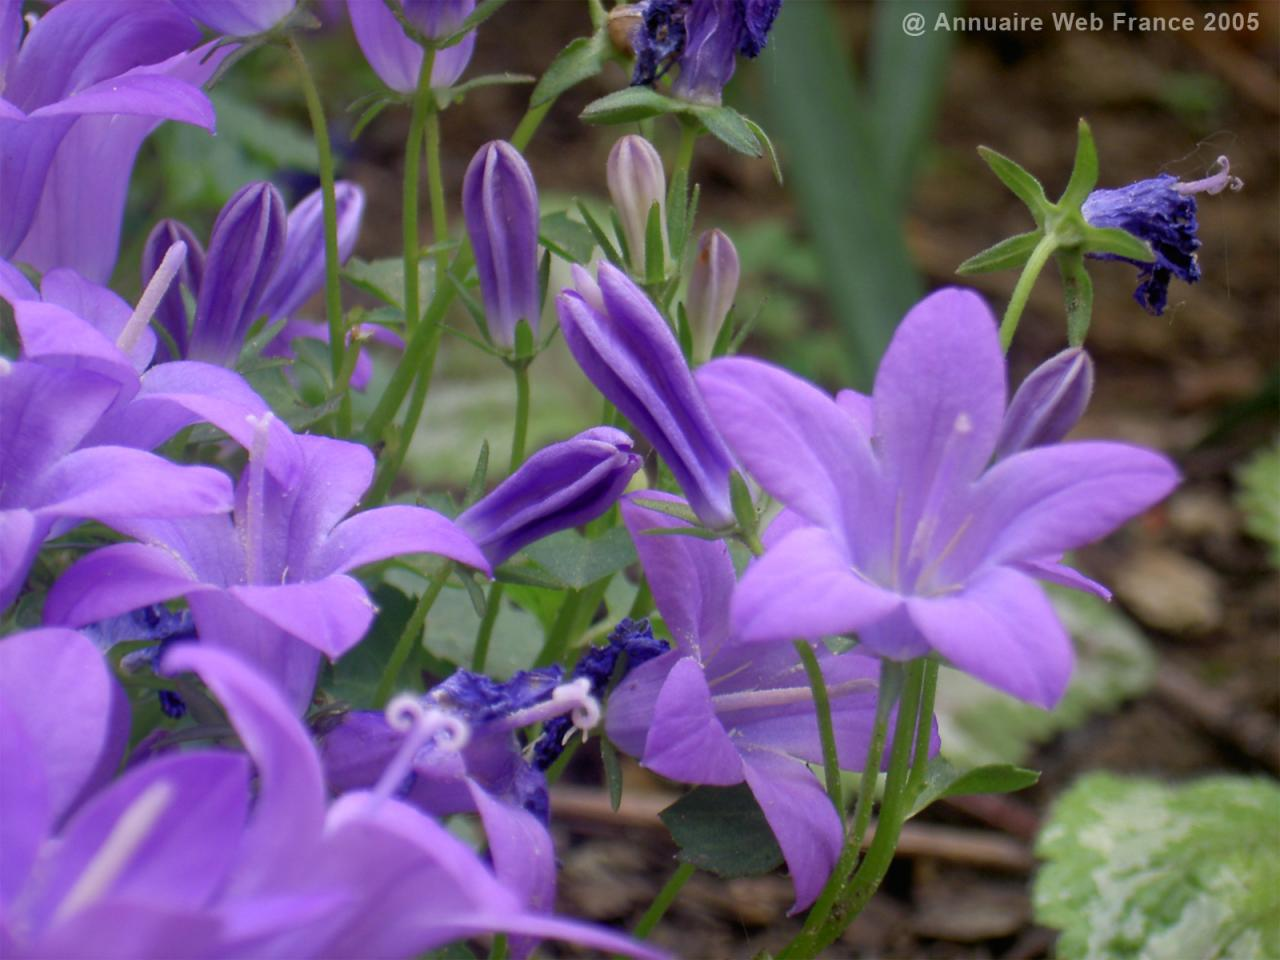 Wallpaper Nature Environnement Fleur